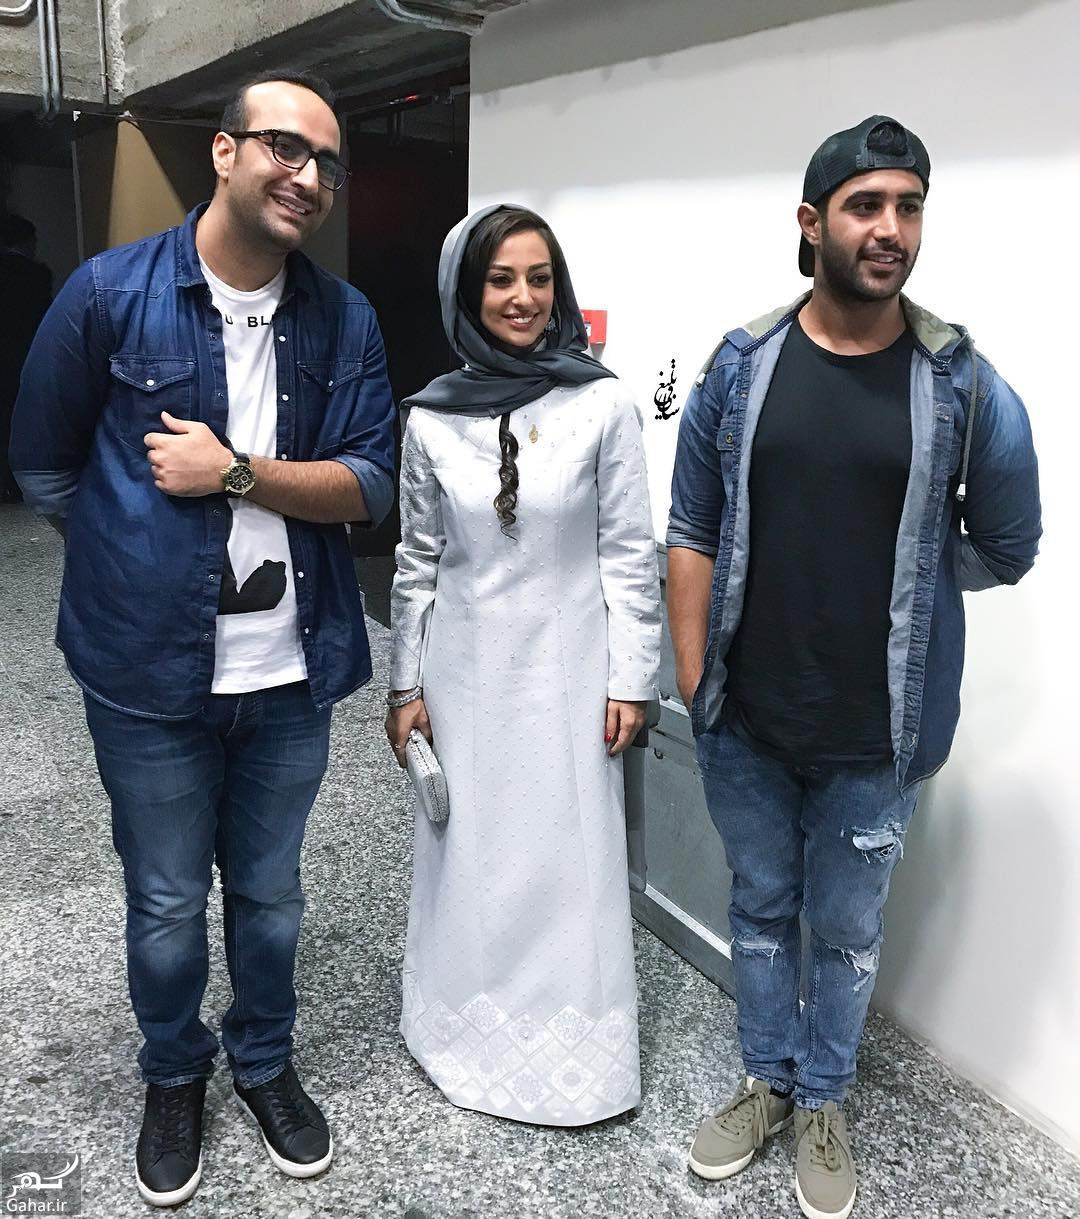 574046 Gahar ir عکس های بازیگران در هفدهمین جشن حافظ